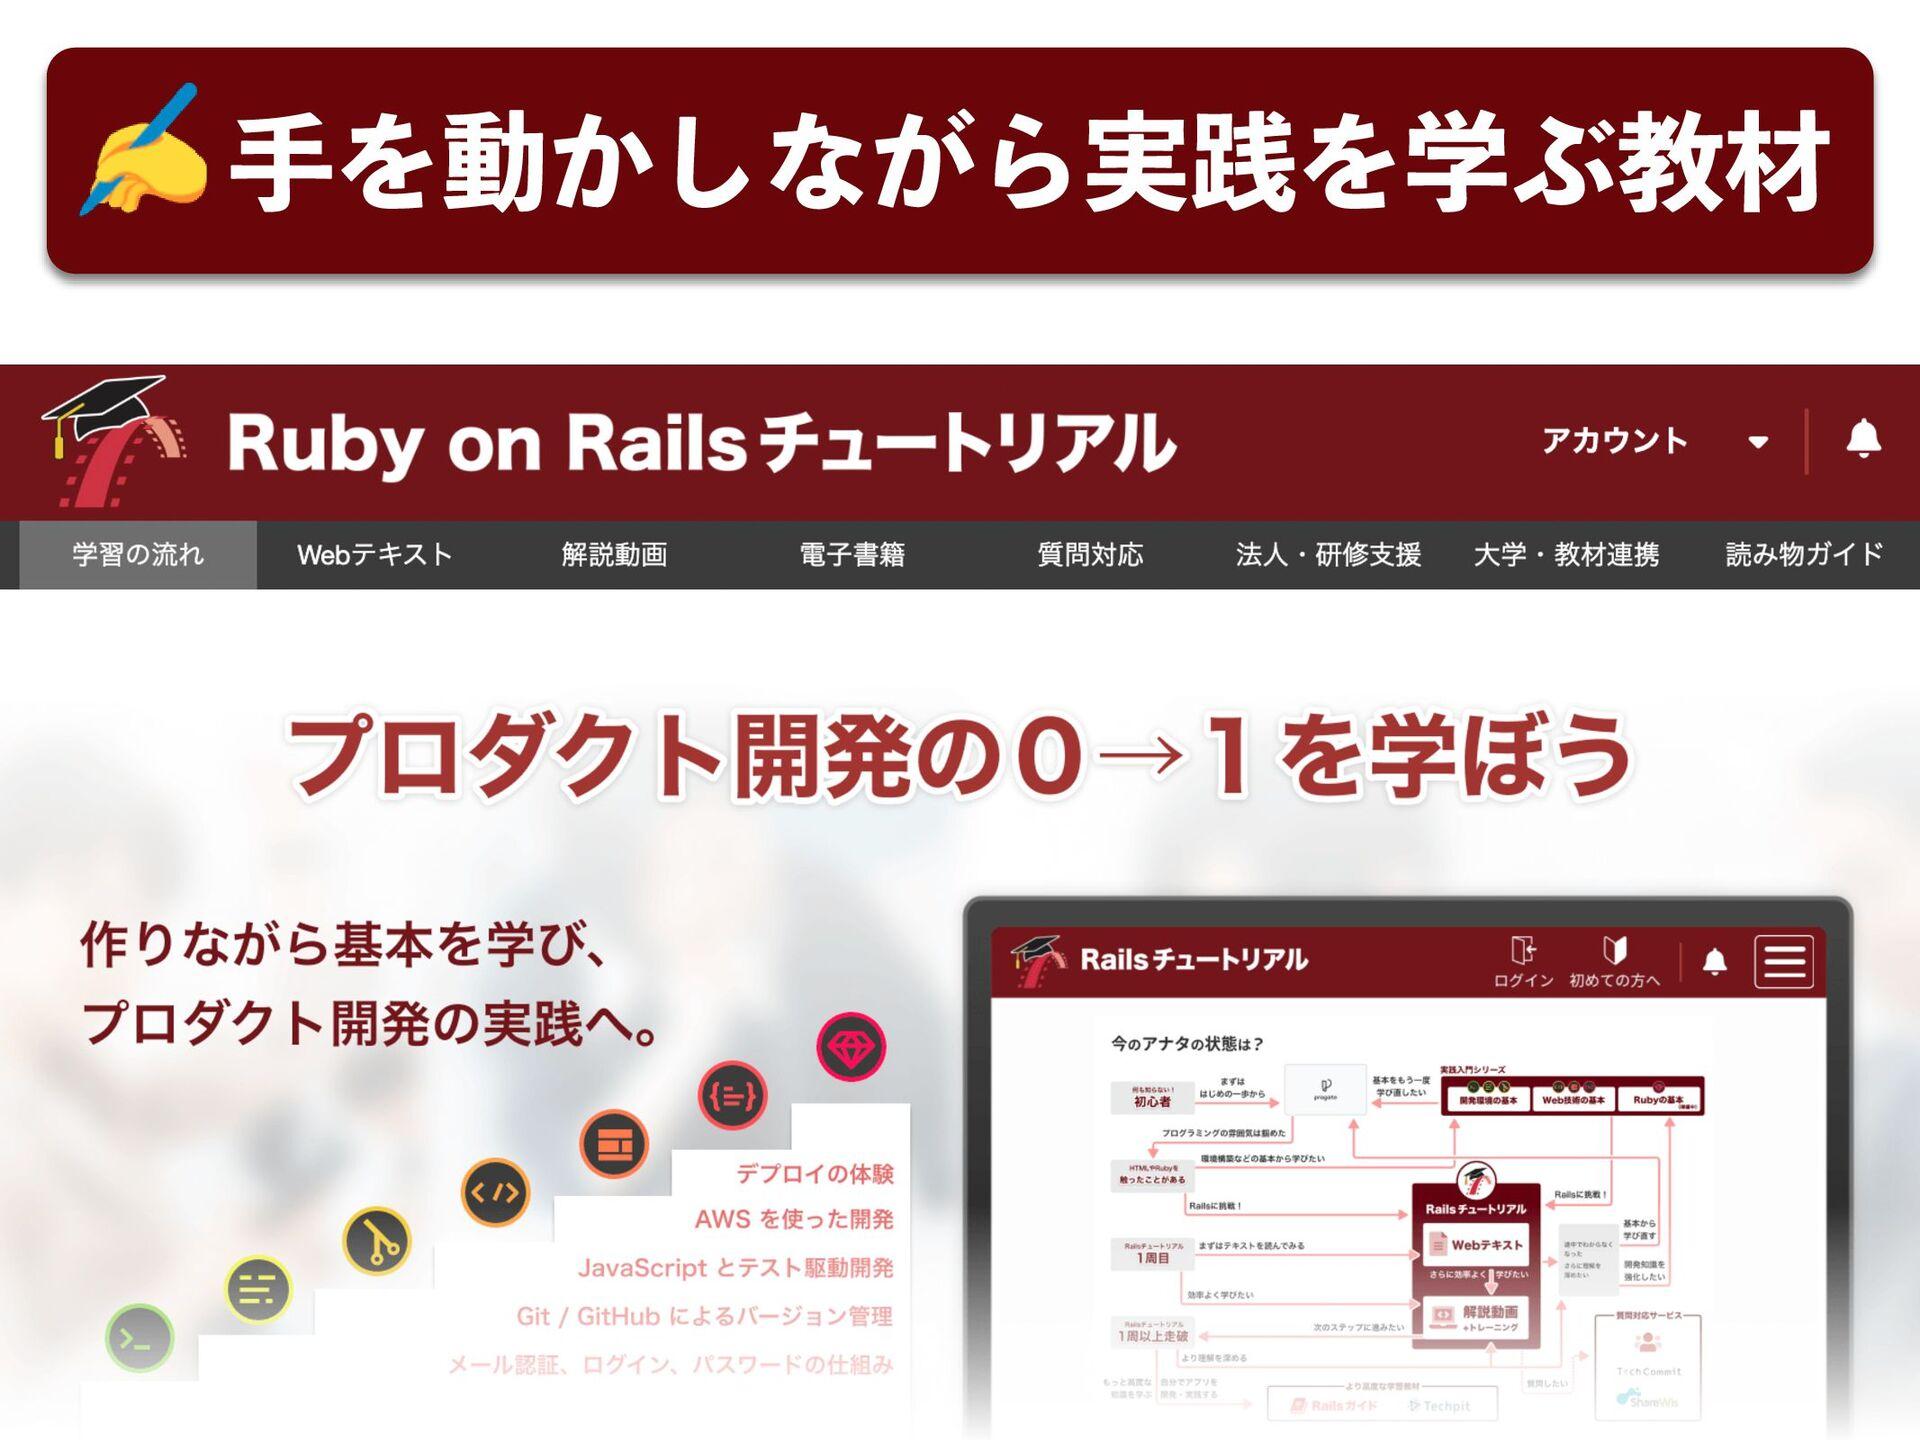 Rails Tutorialɹ  ӳޠ൛IUUQTSBJMTUVUPSJBMPS...